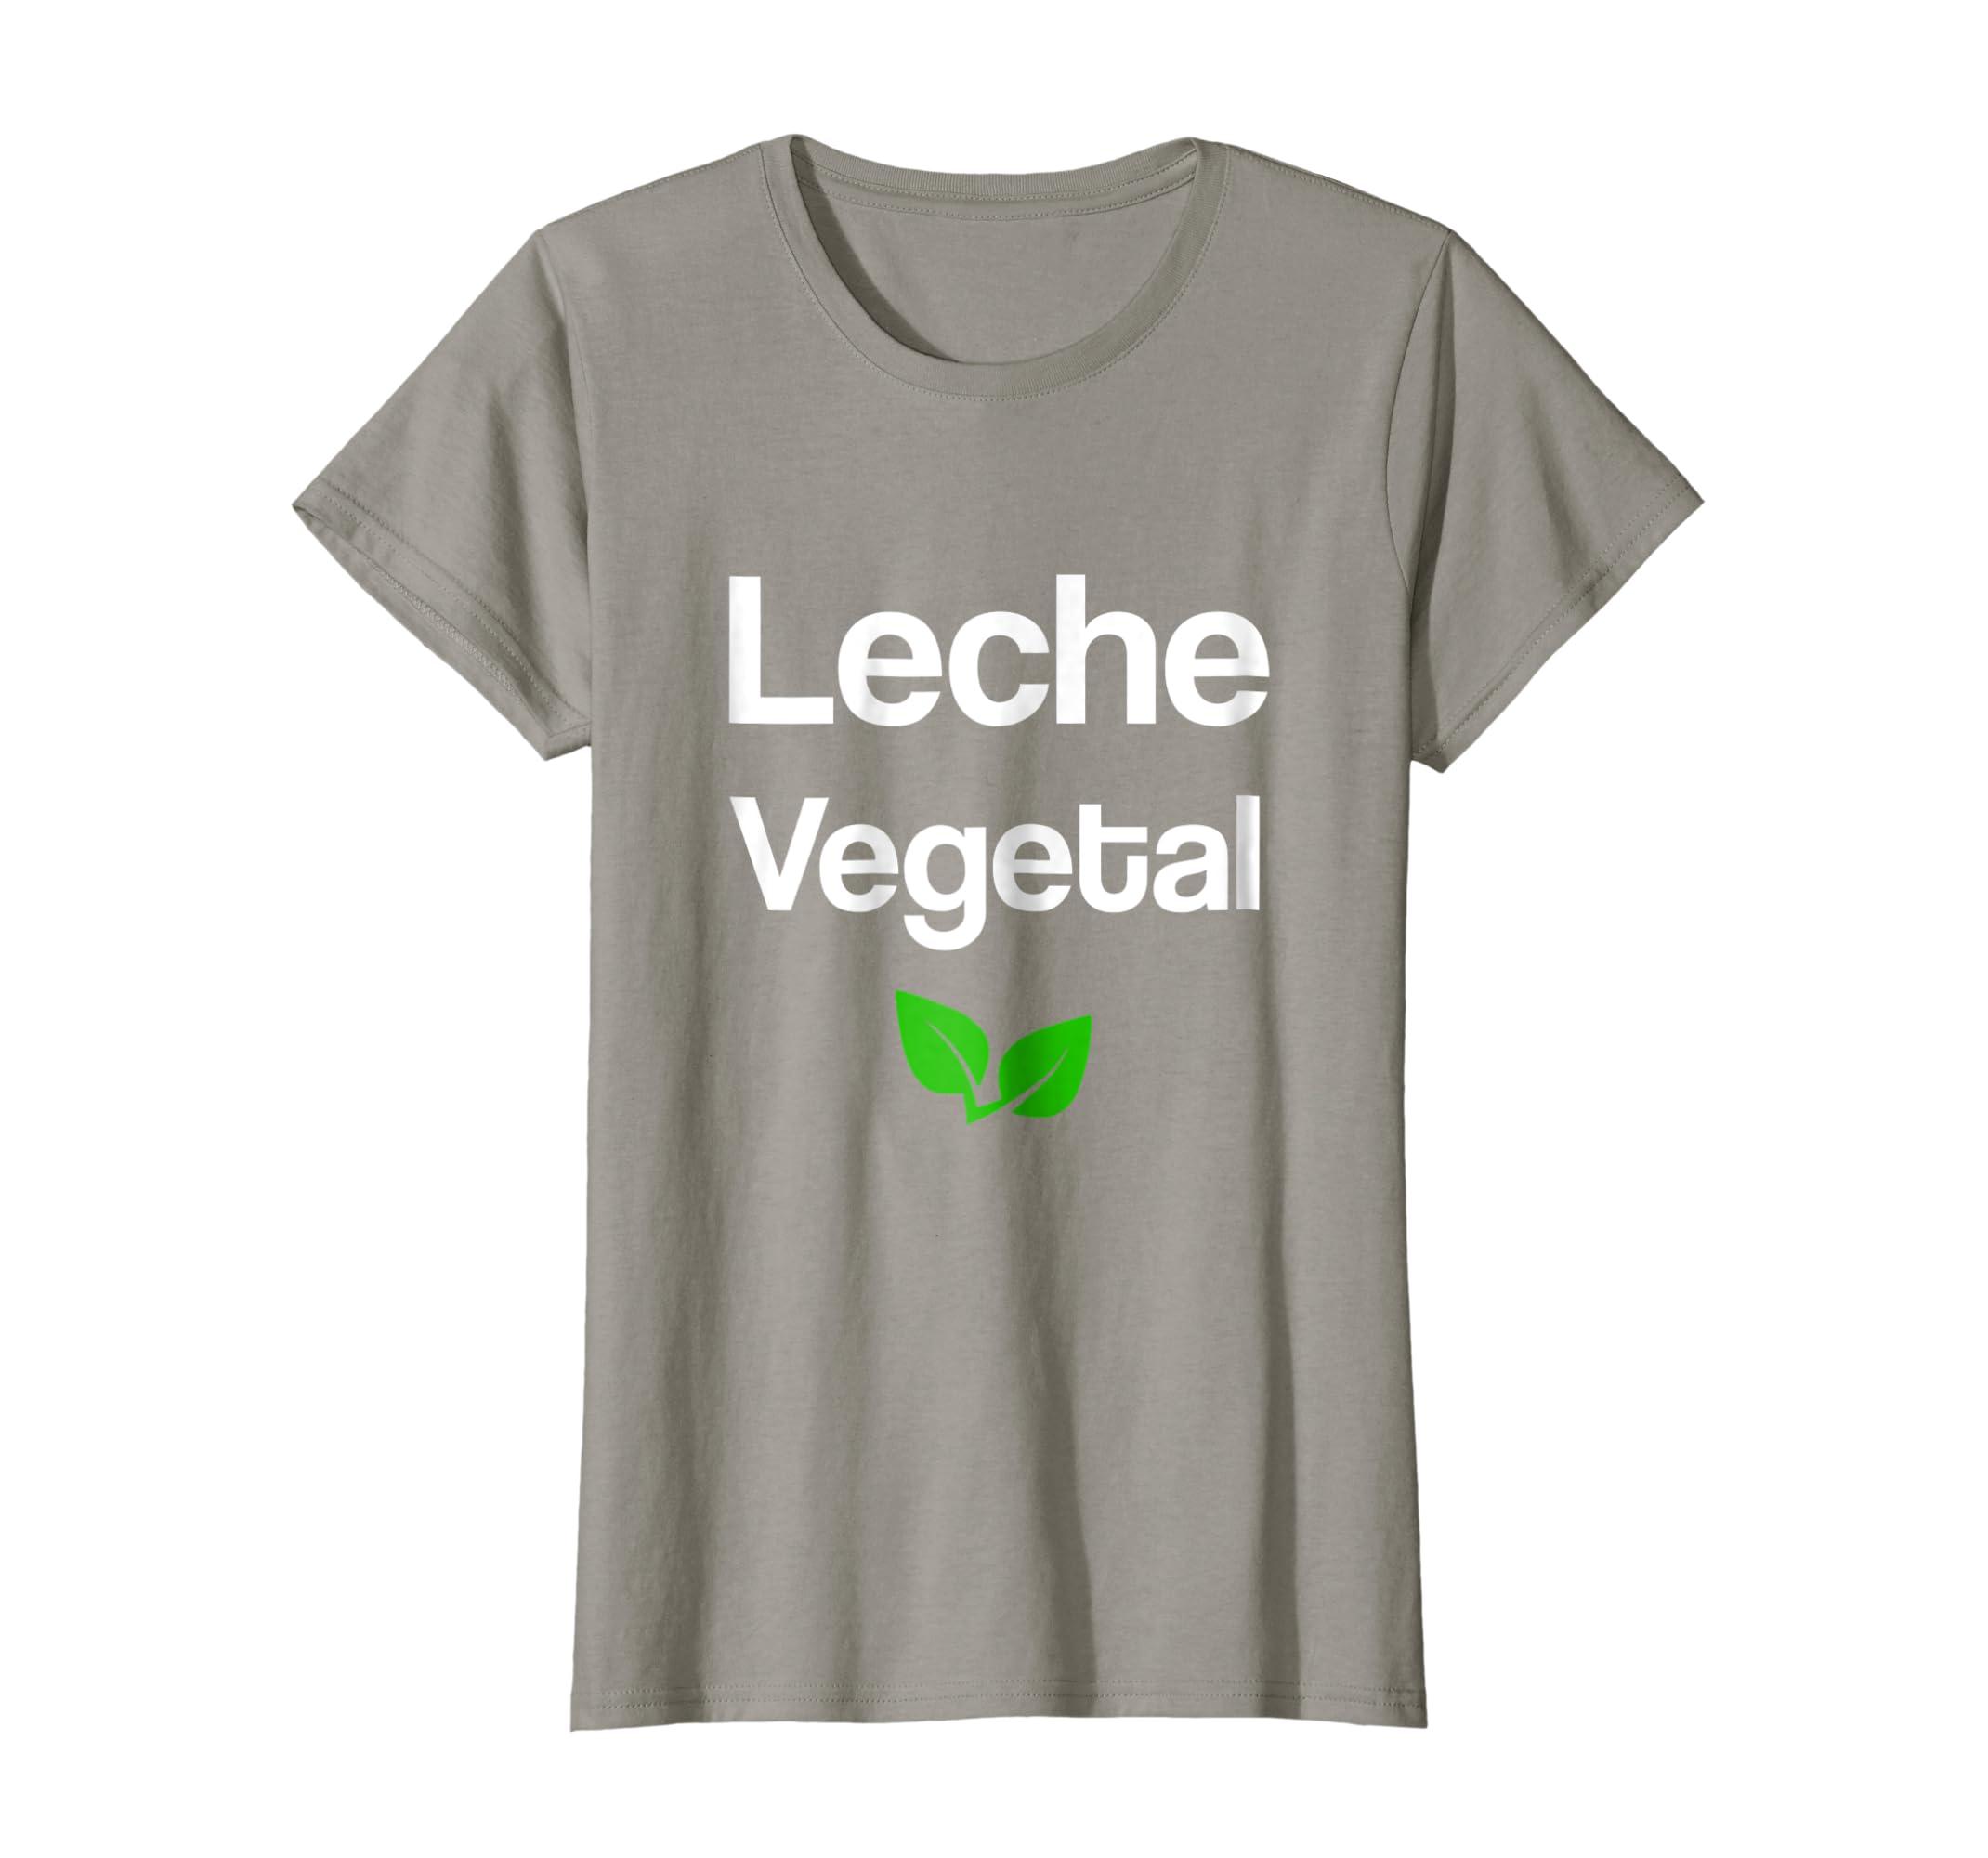 Amazon.com: Leche vegetal Shirt Camiseta con frases Veganos Vegetarianos: Clothing